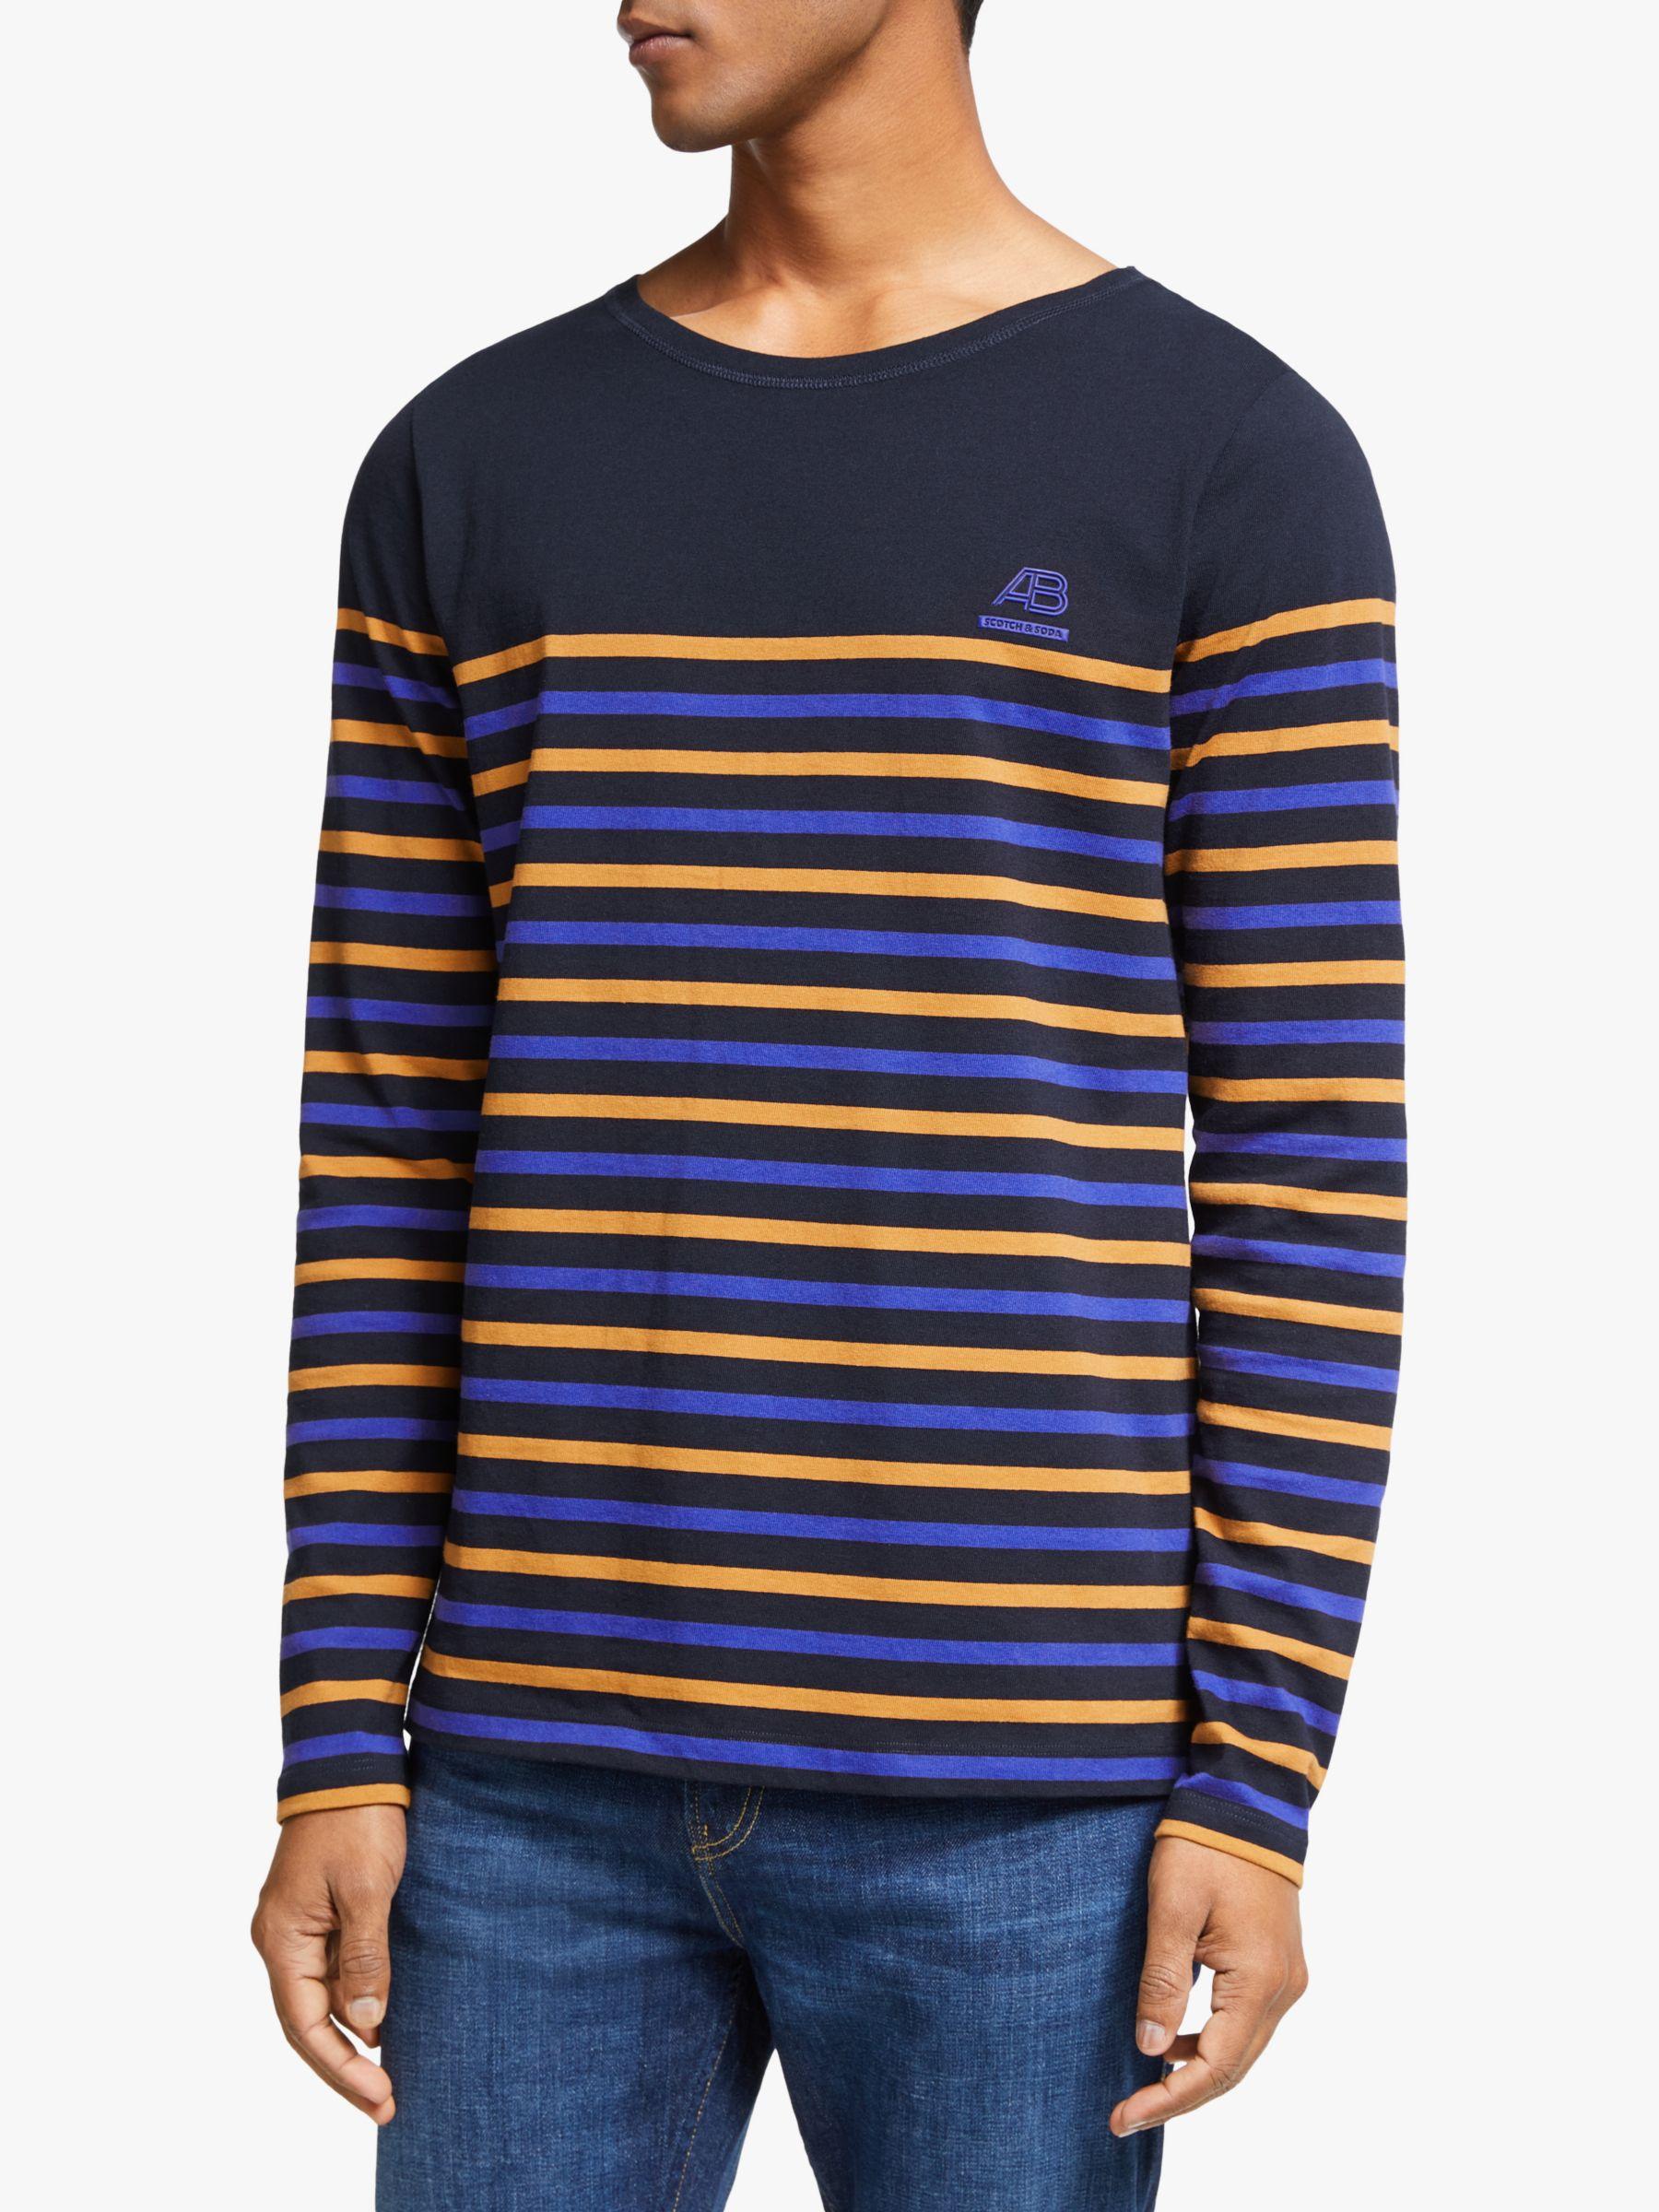 Scotch & Soda Scotch & Soda Multi Breton Stripe Long Sleeve T-Shirt, Comba A